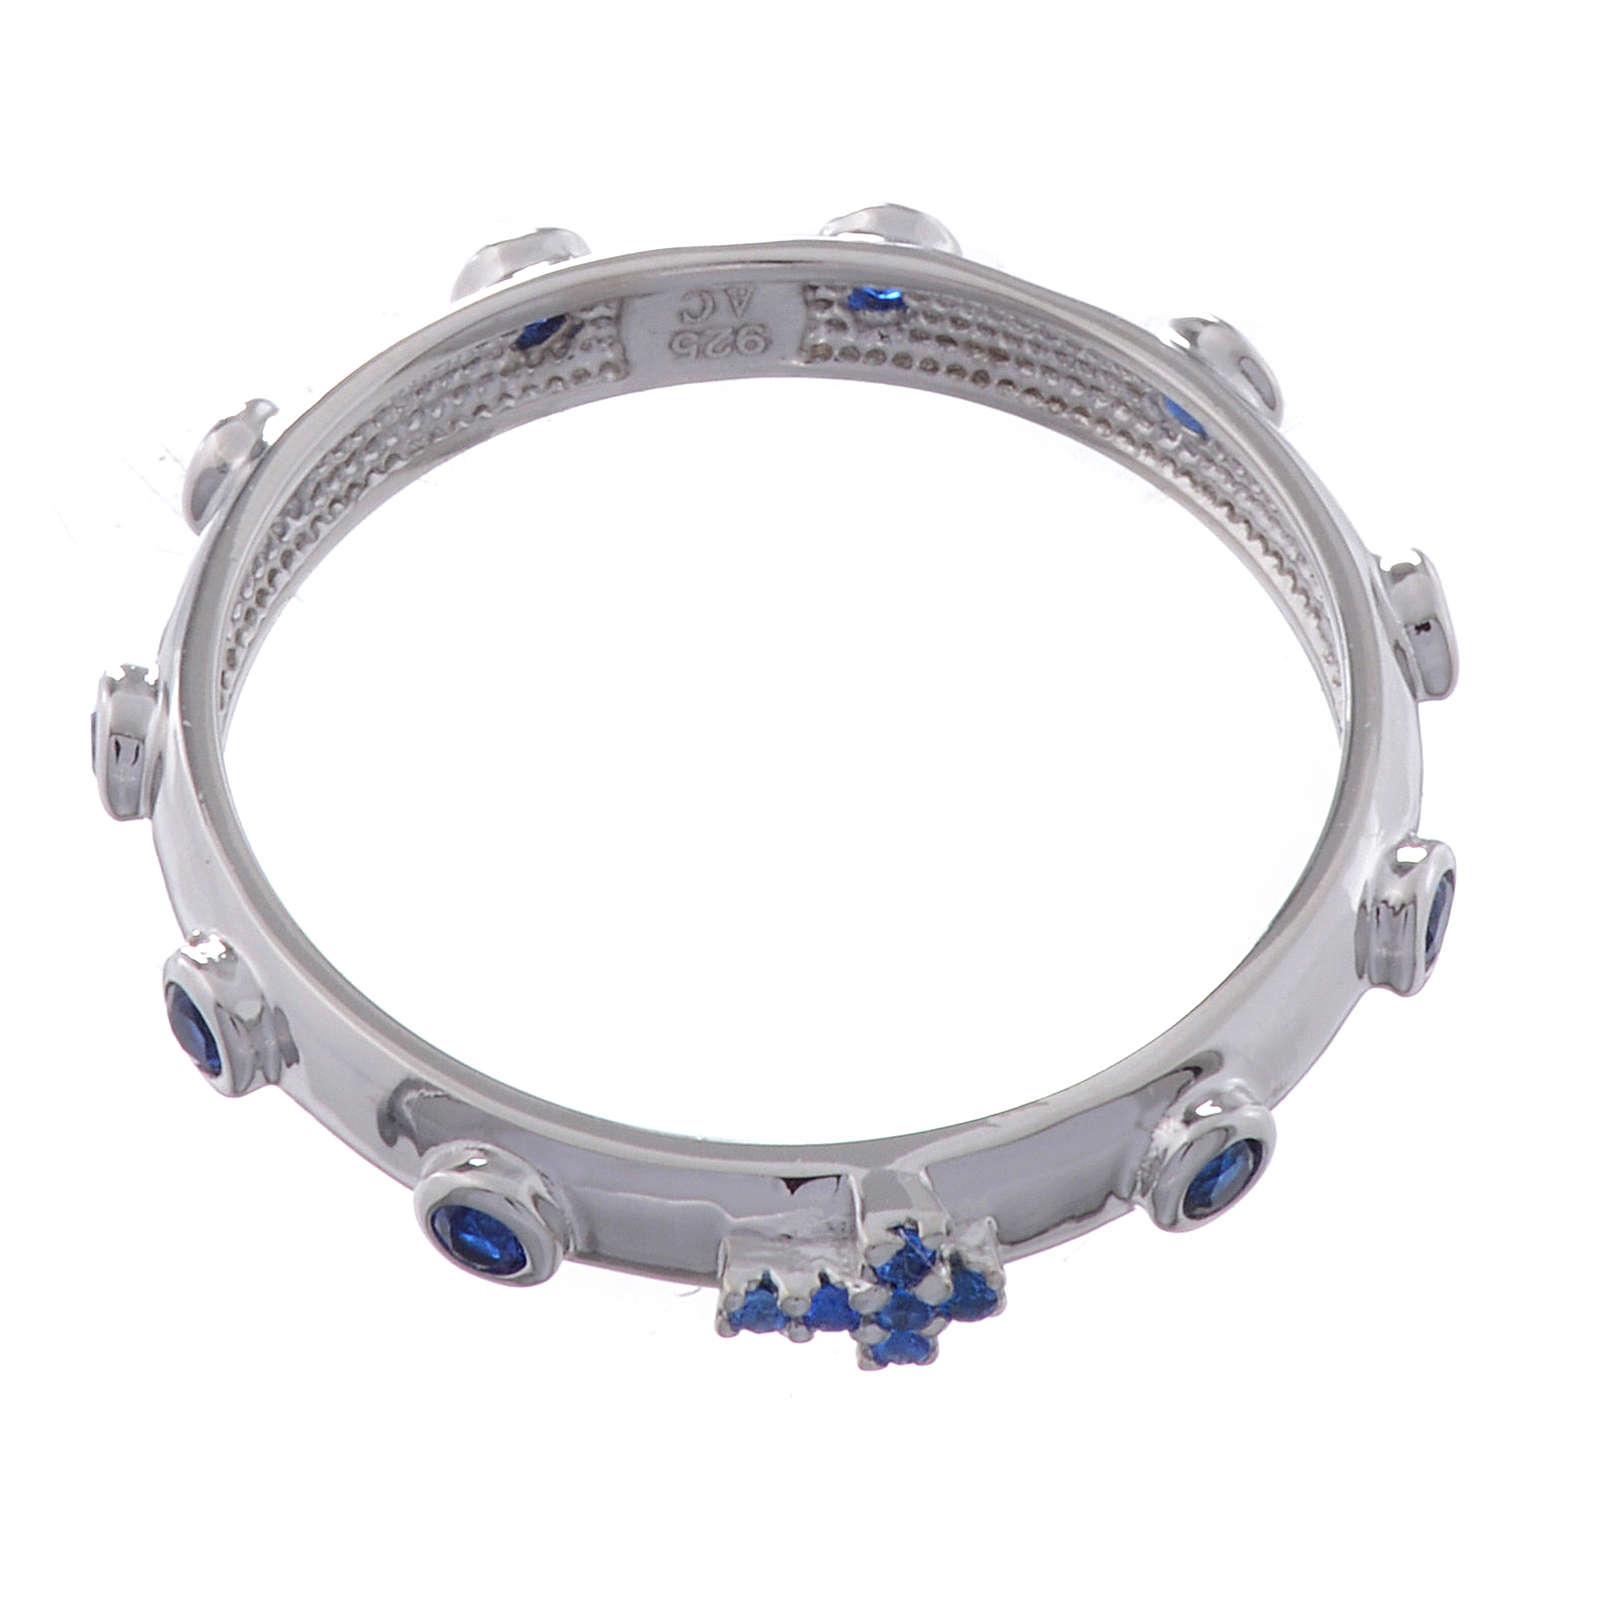 Bague chapelet AMEN argent 925 zircons bleus Rhodium 3